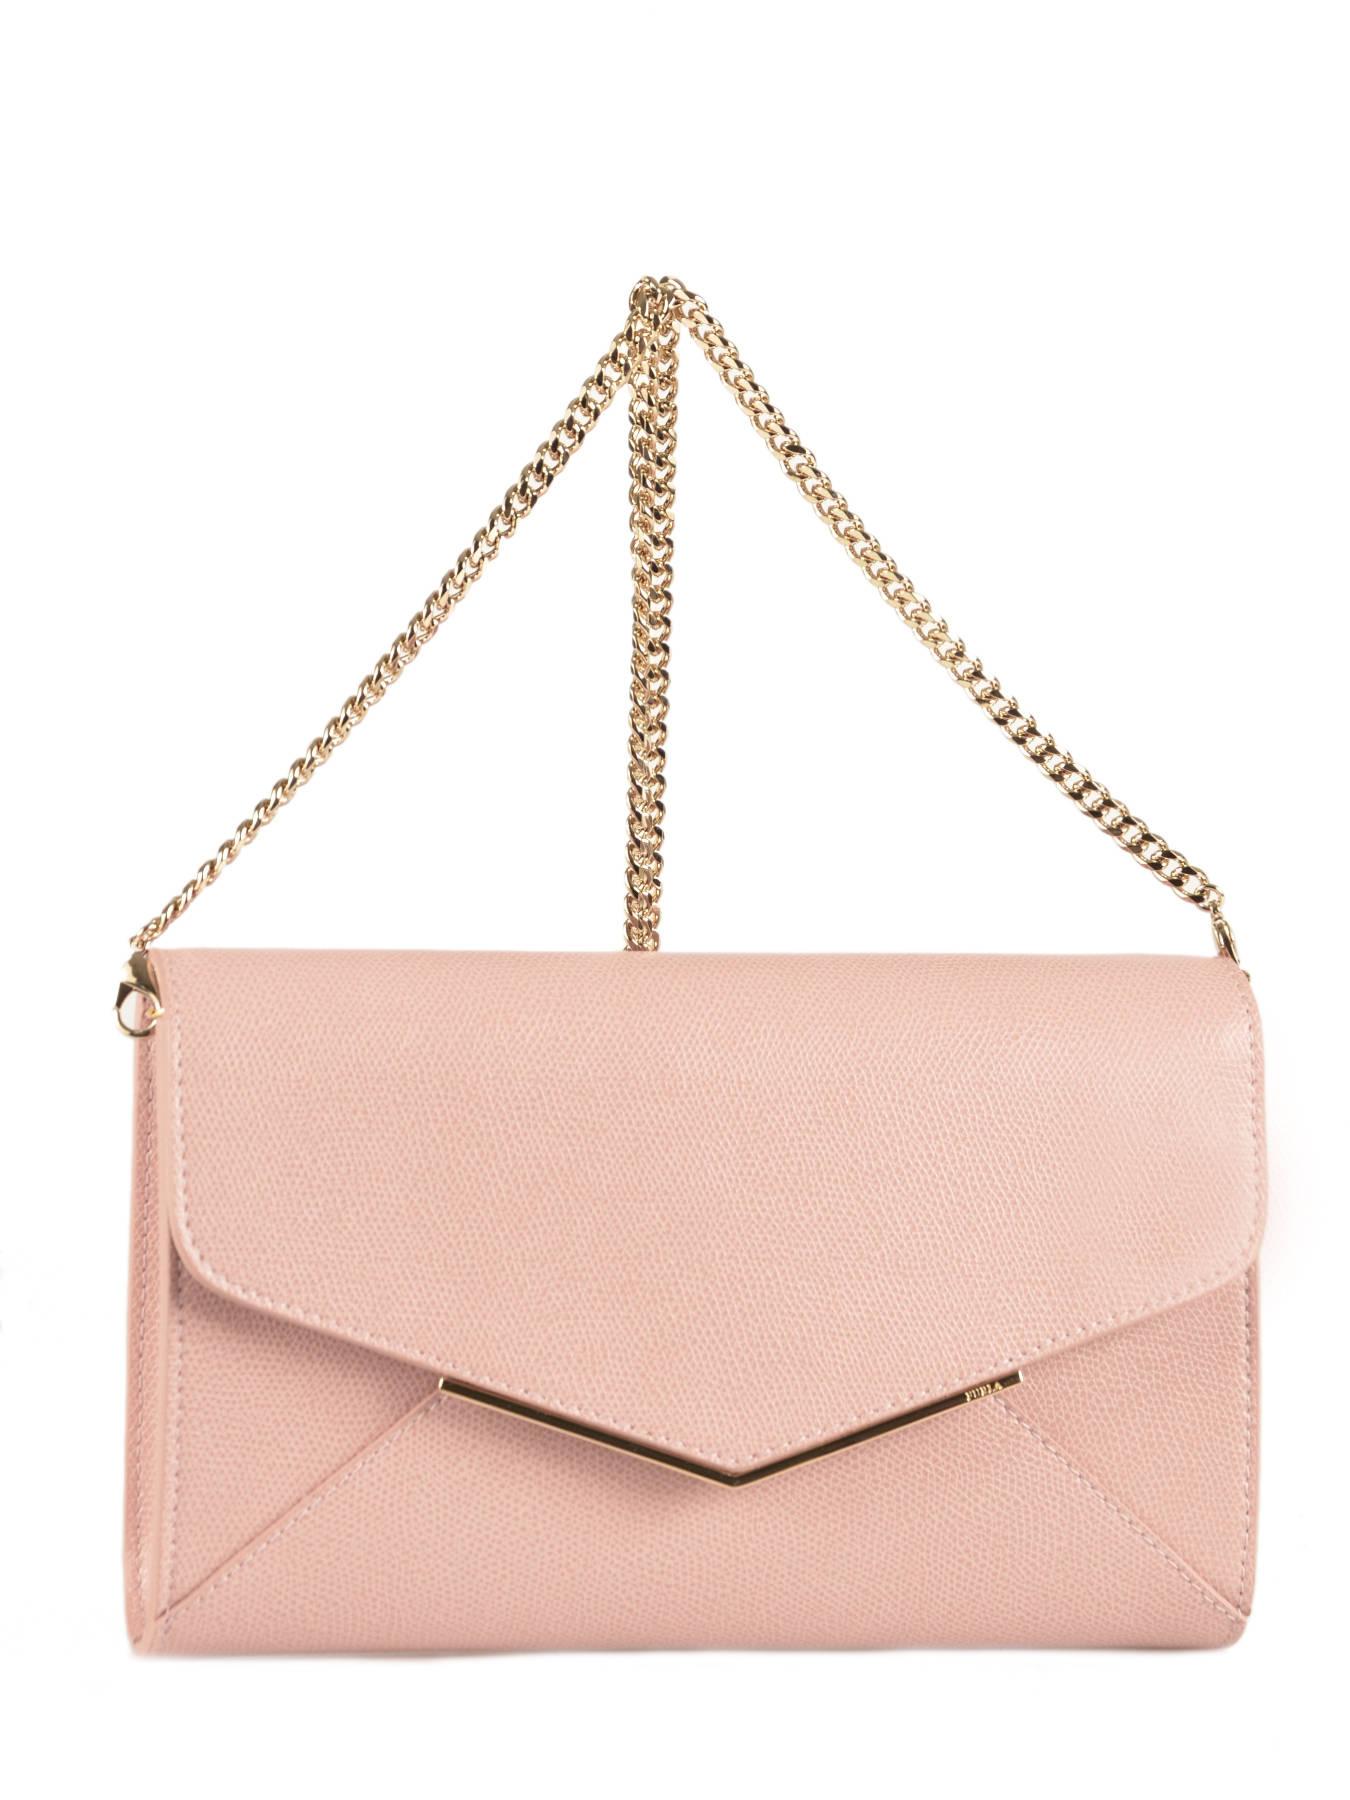 Furla Bag Cherie Best Prices